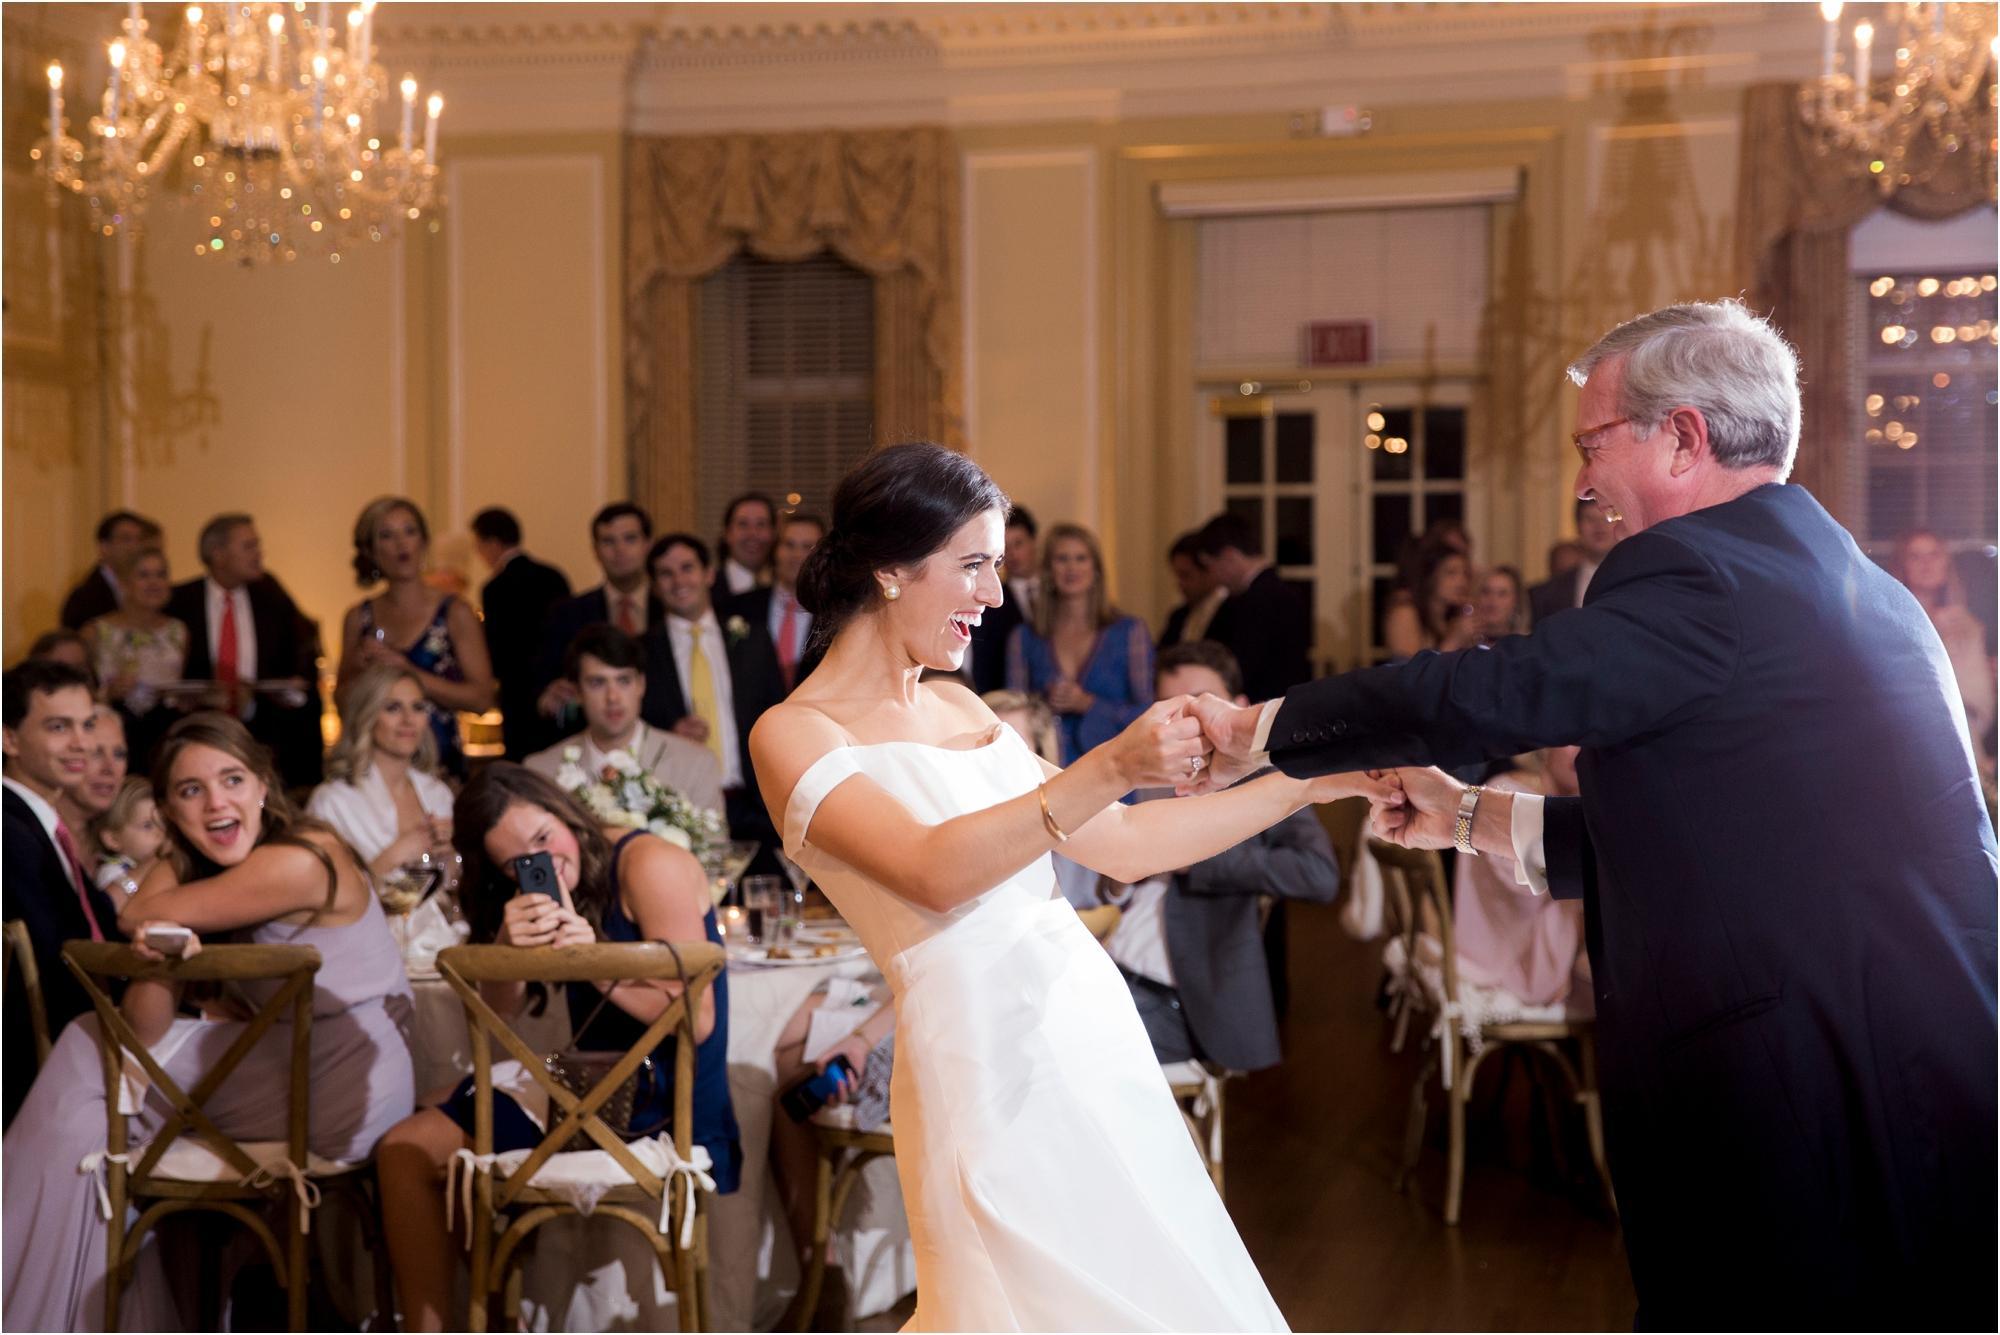 claire-thomas-farmington-country-club-charlottesville-virginia-wedding-photos_0043.jpg